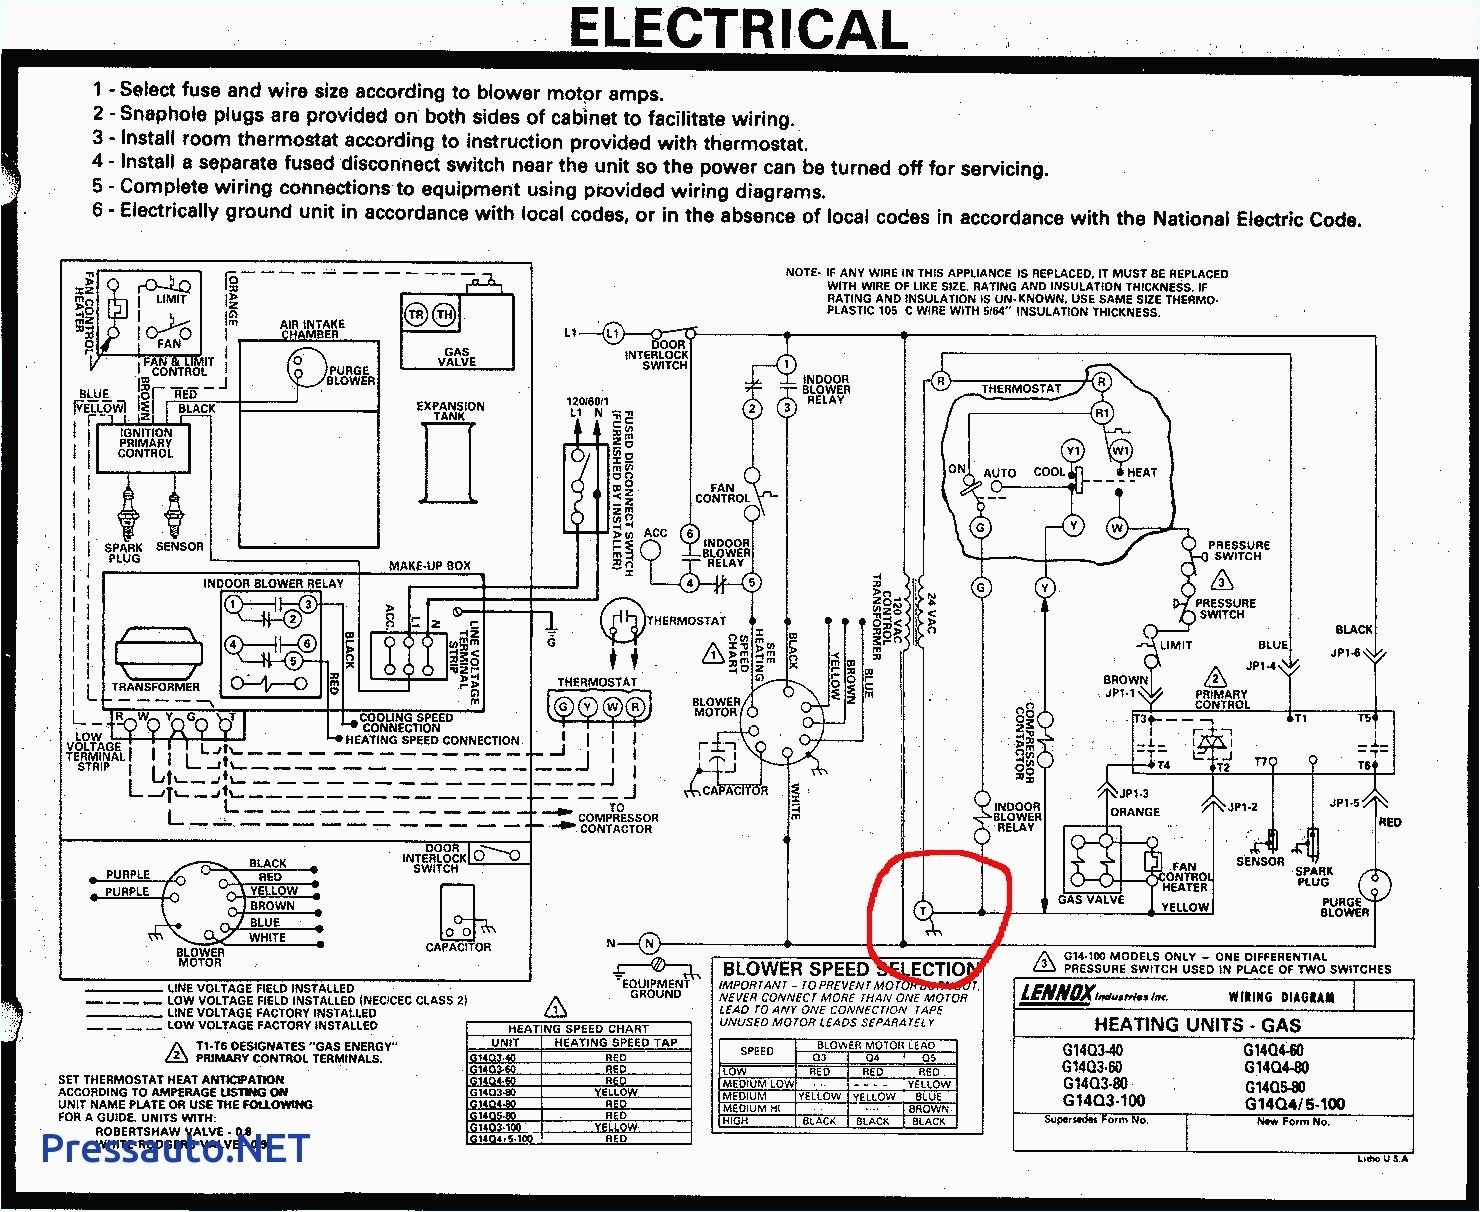 lennox furnace wiring diagram 16 g wiring diagram expert lennox wiring diagram for heat pump